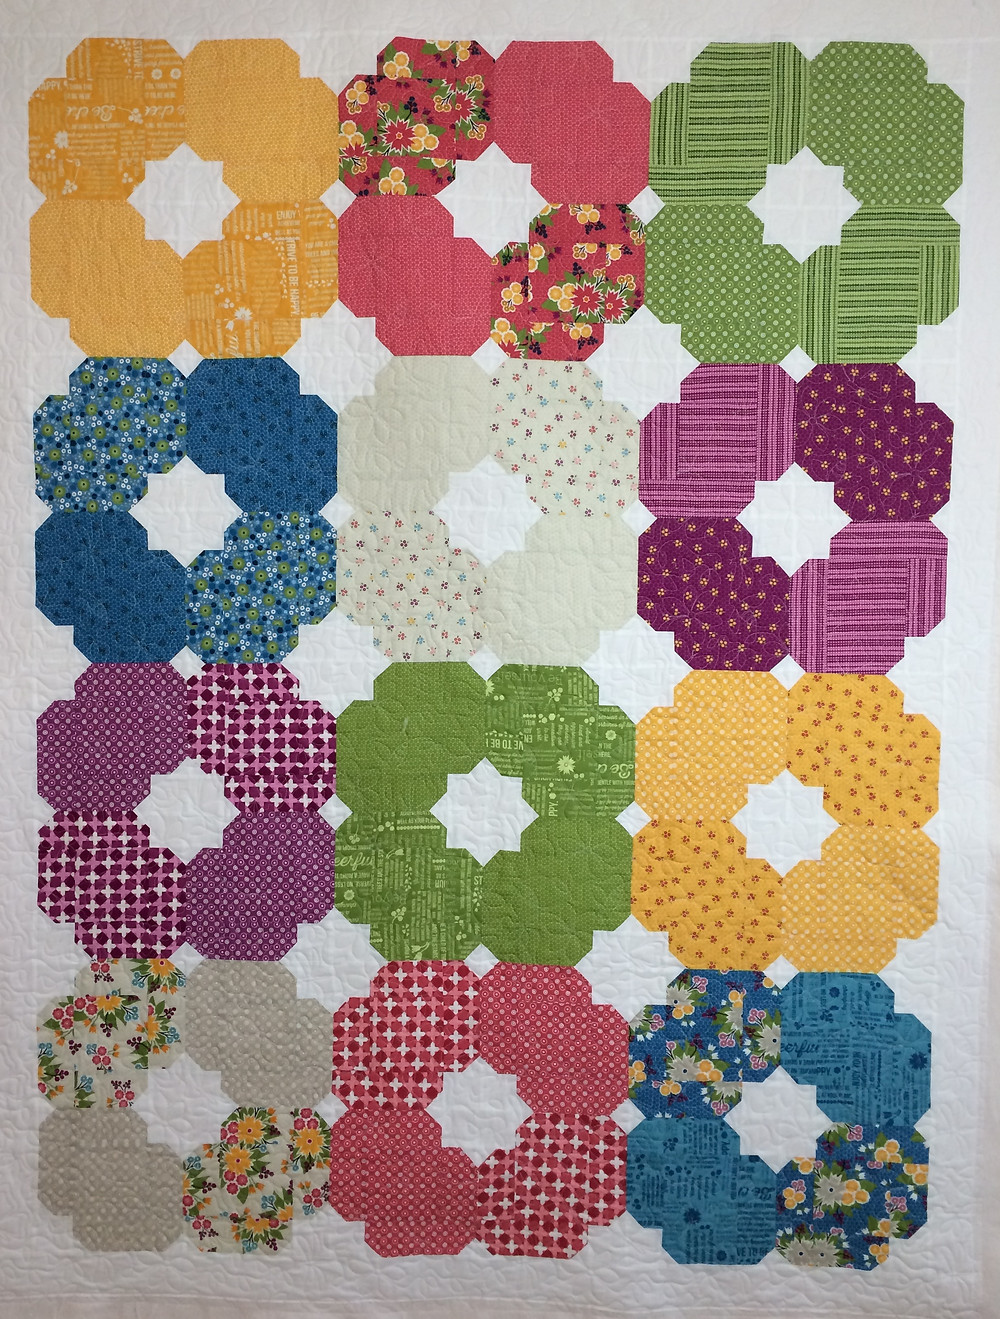 meadow bloom quilt in bursting color